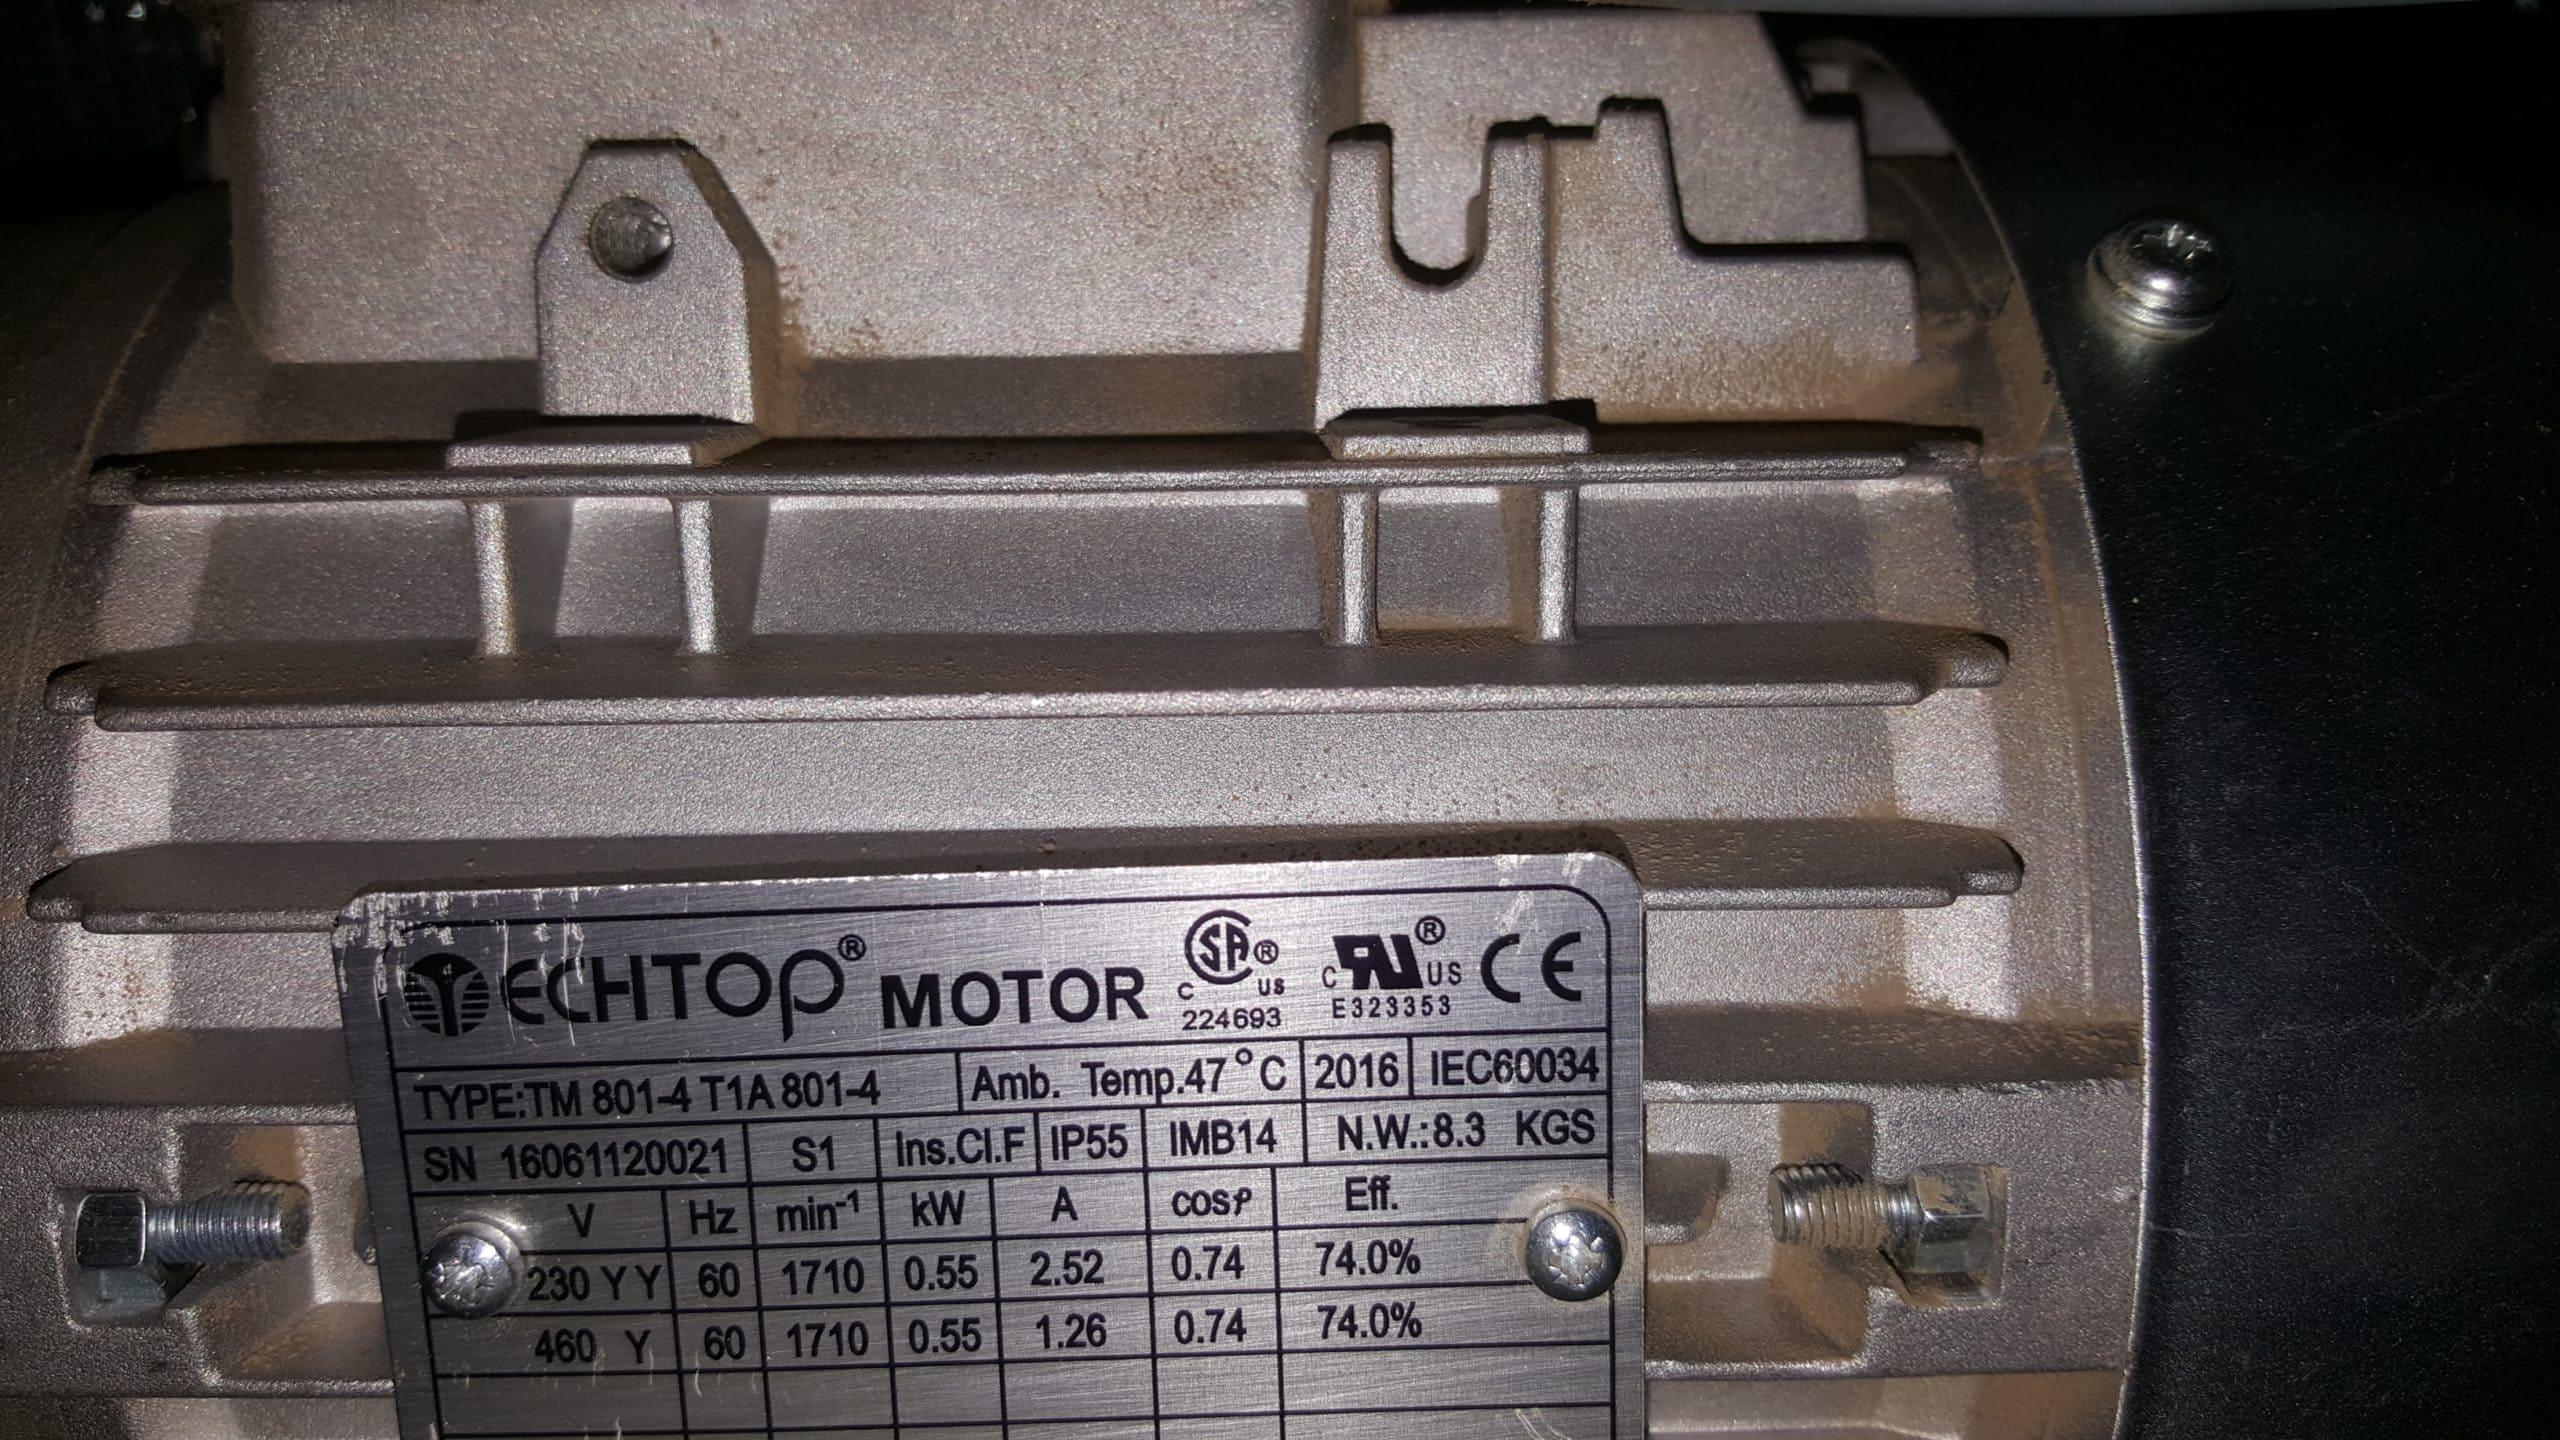 Electric Motor ID Tag